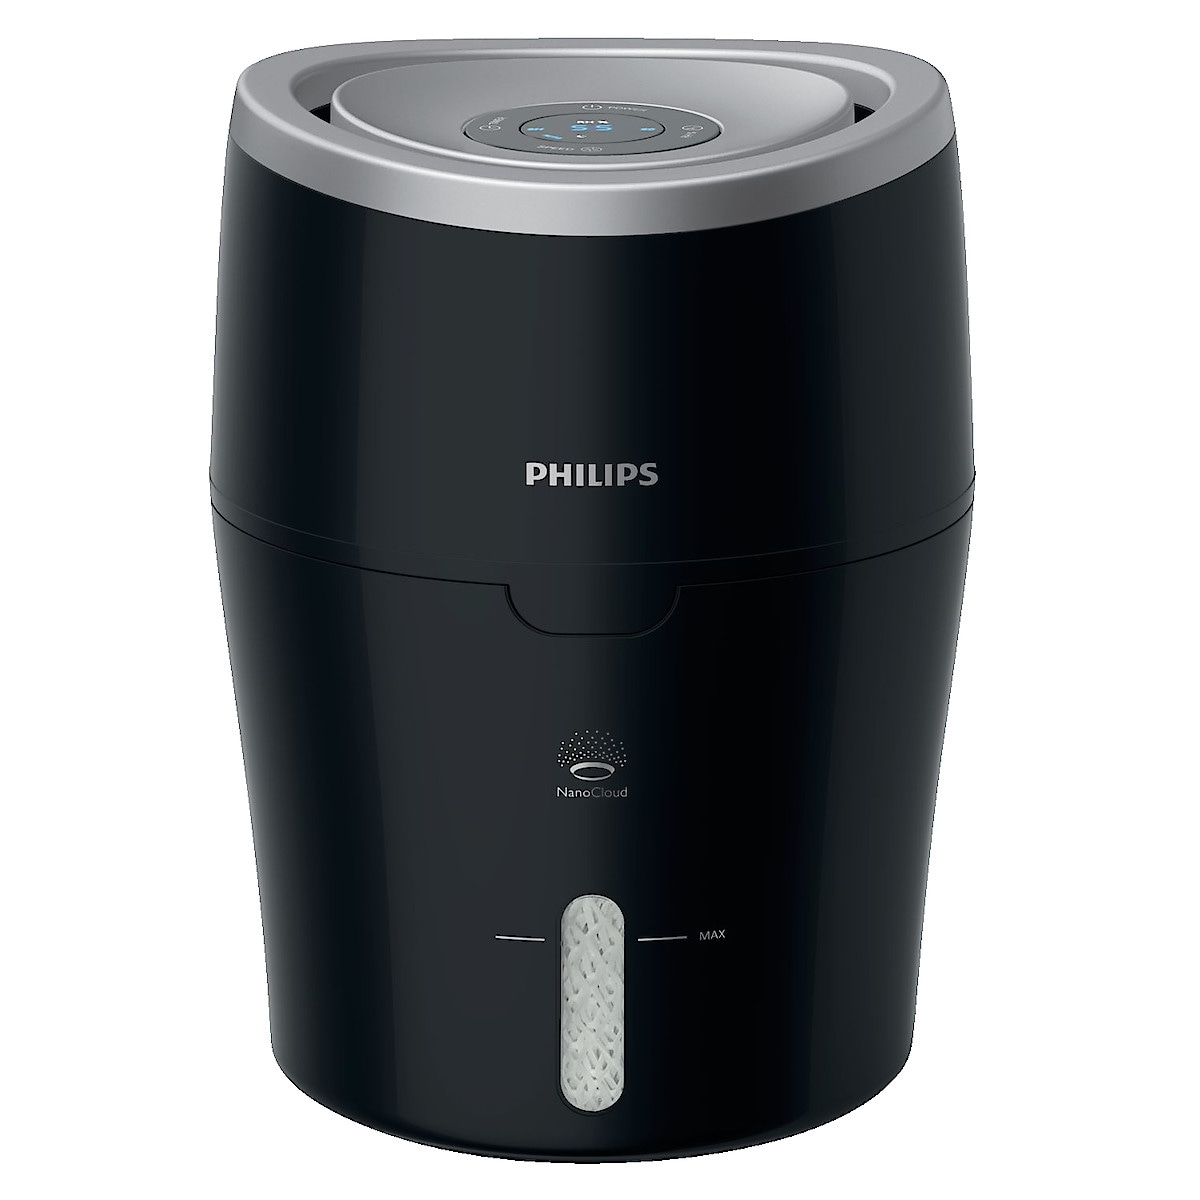 Luftfuktare Philips HU4813